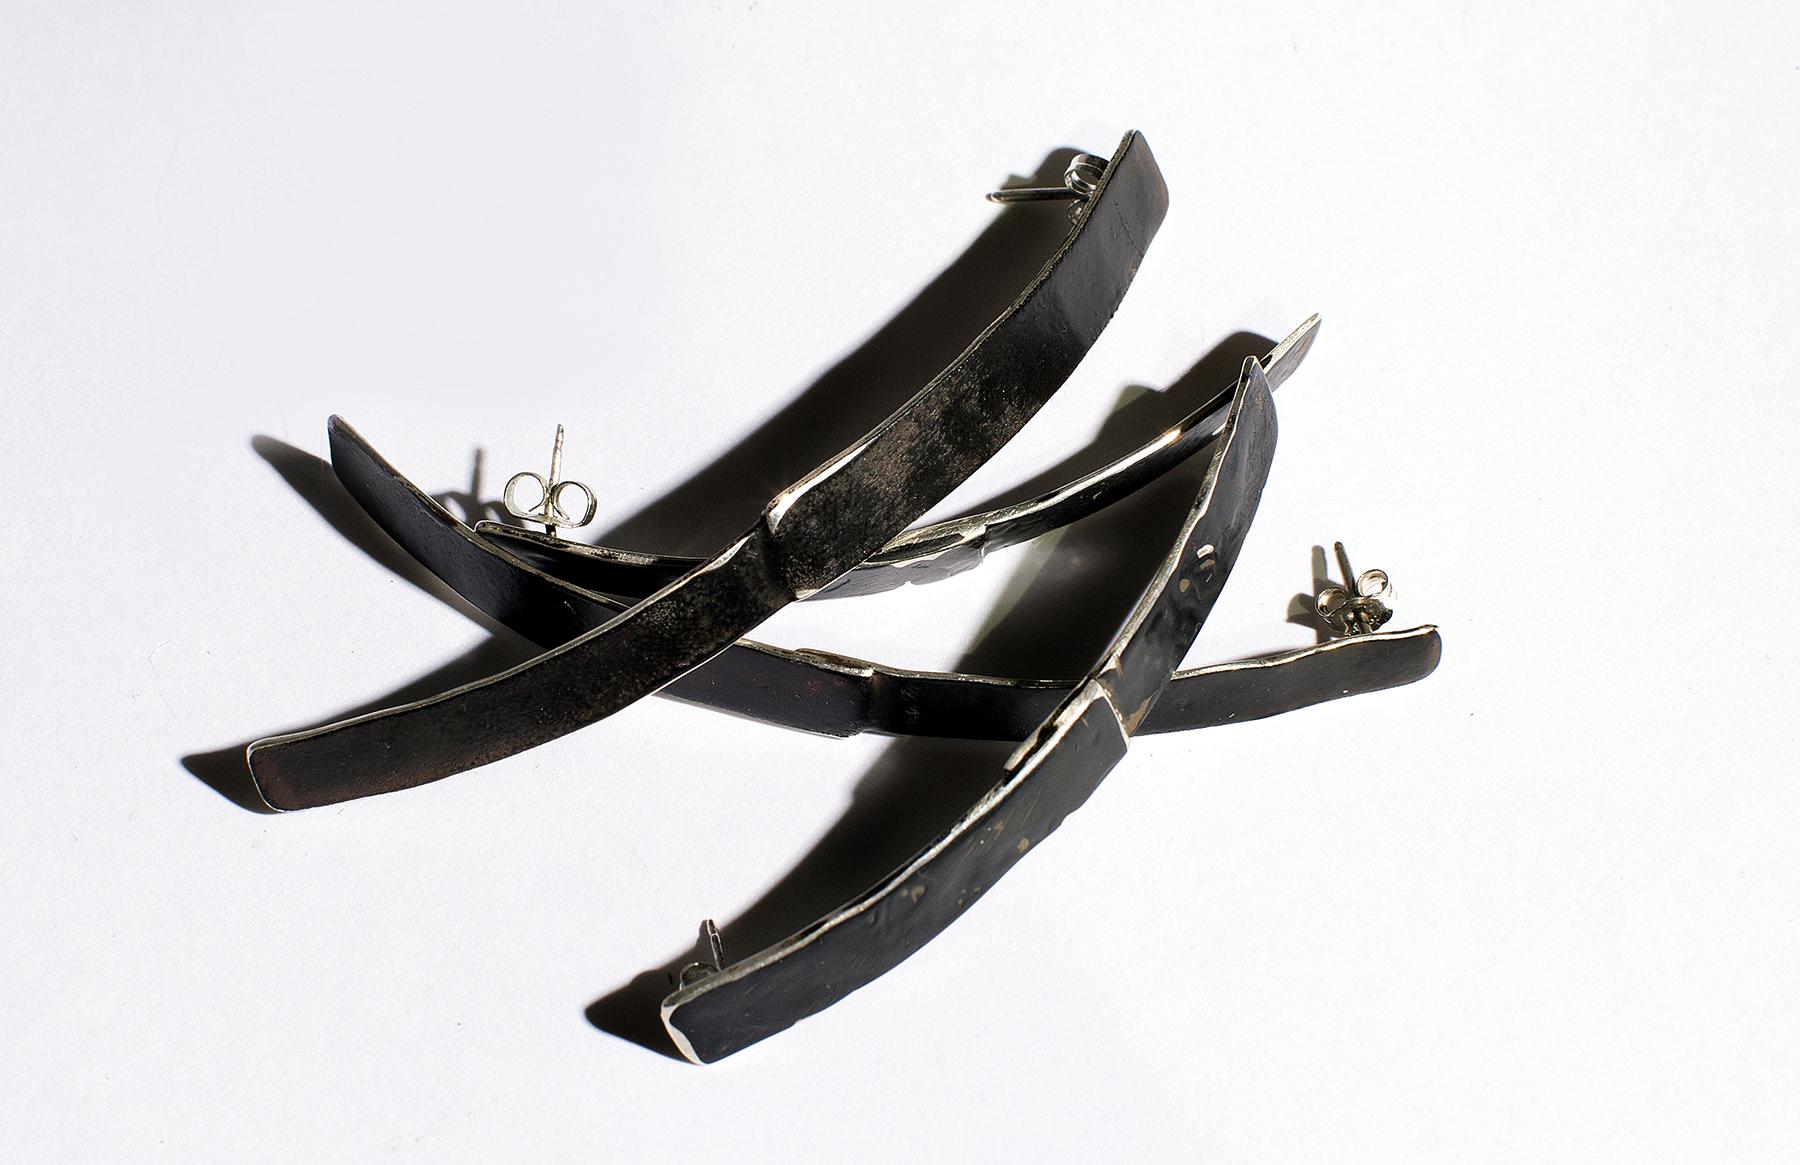 IronAge-Earrings-HVGV-FotobyMateo.jpg